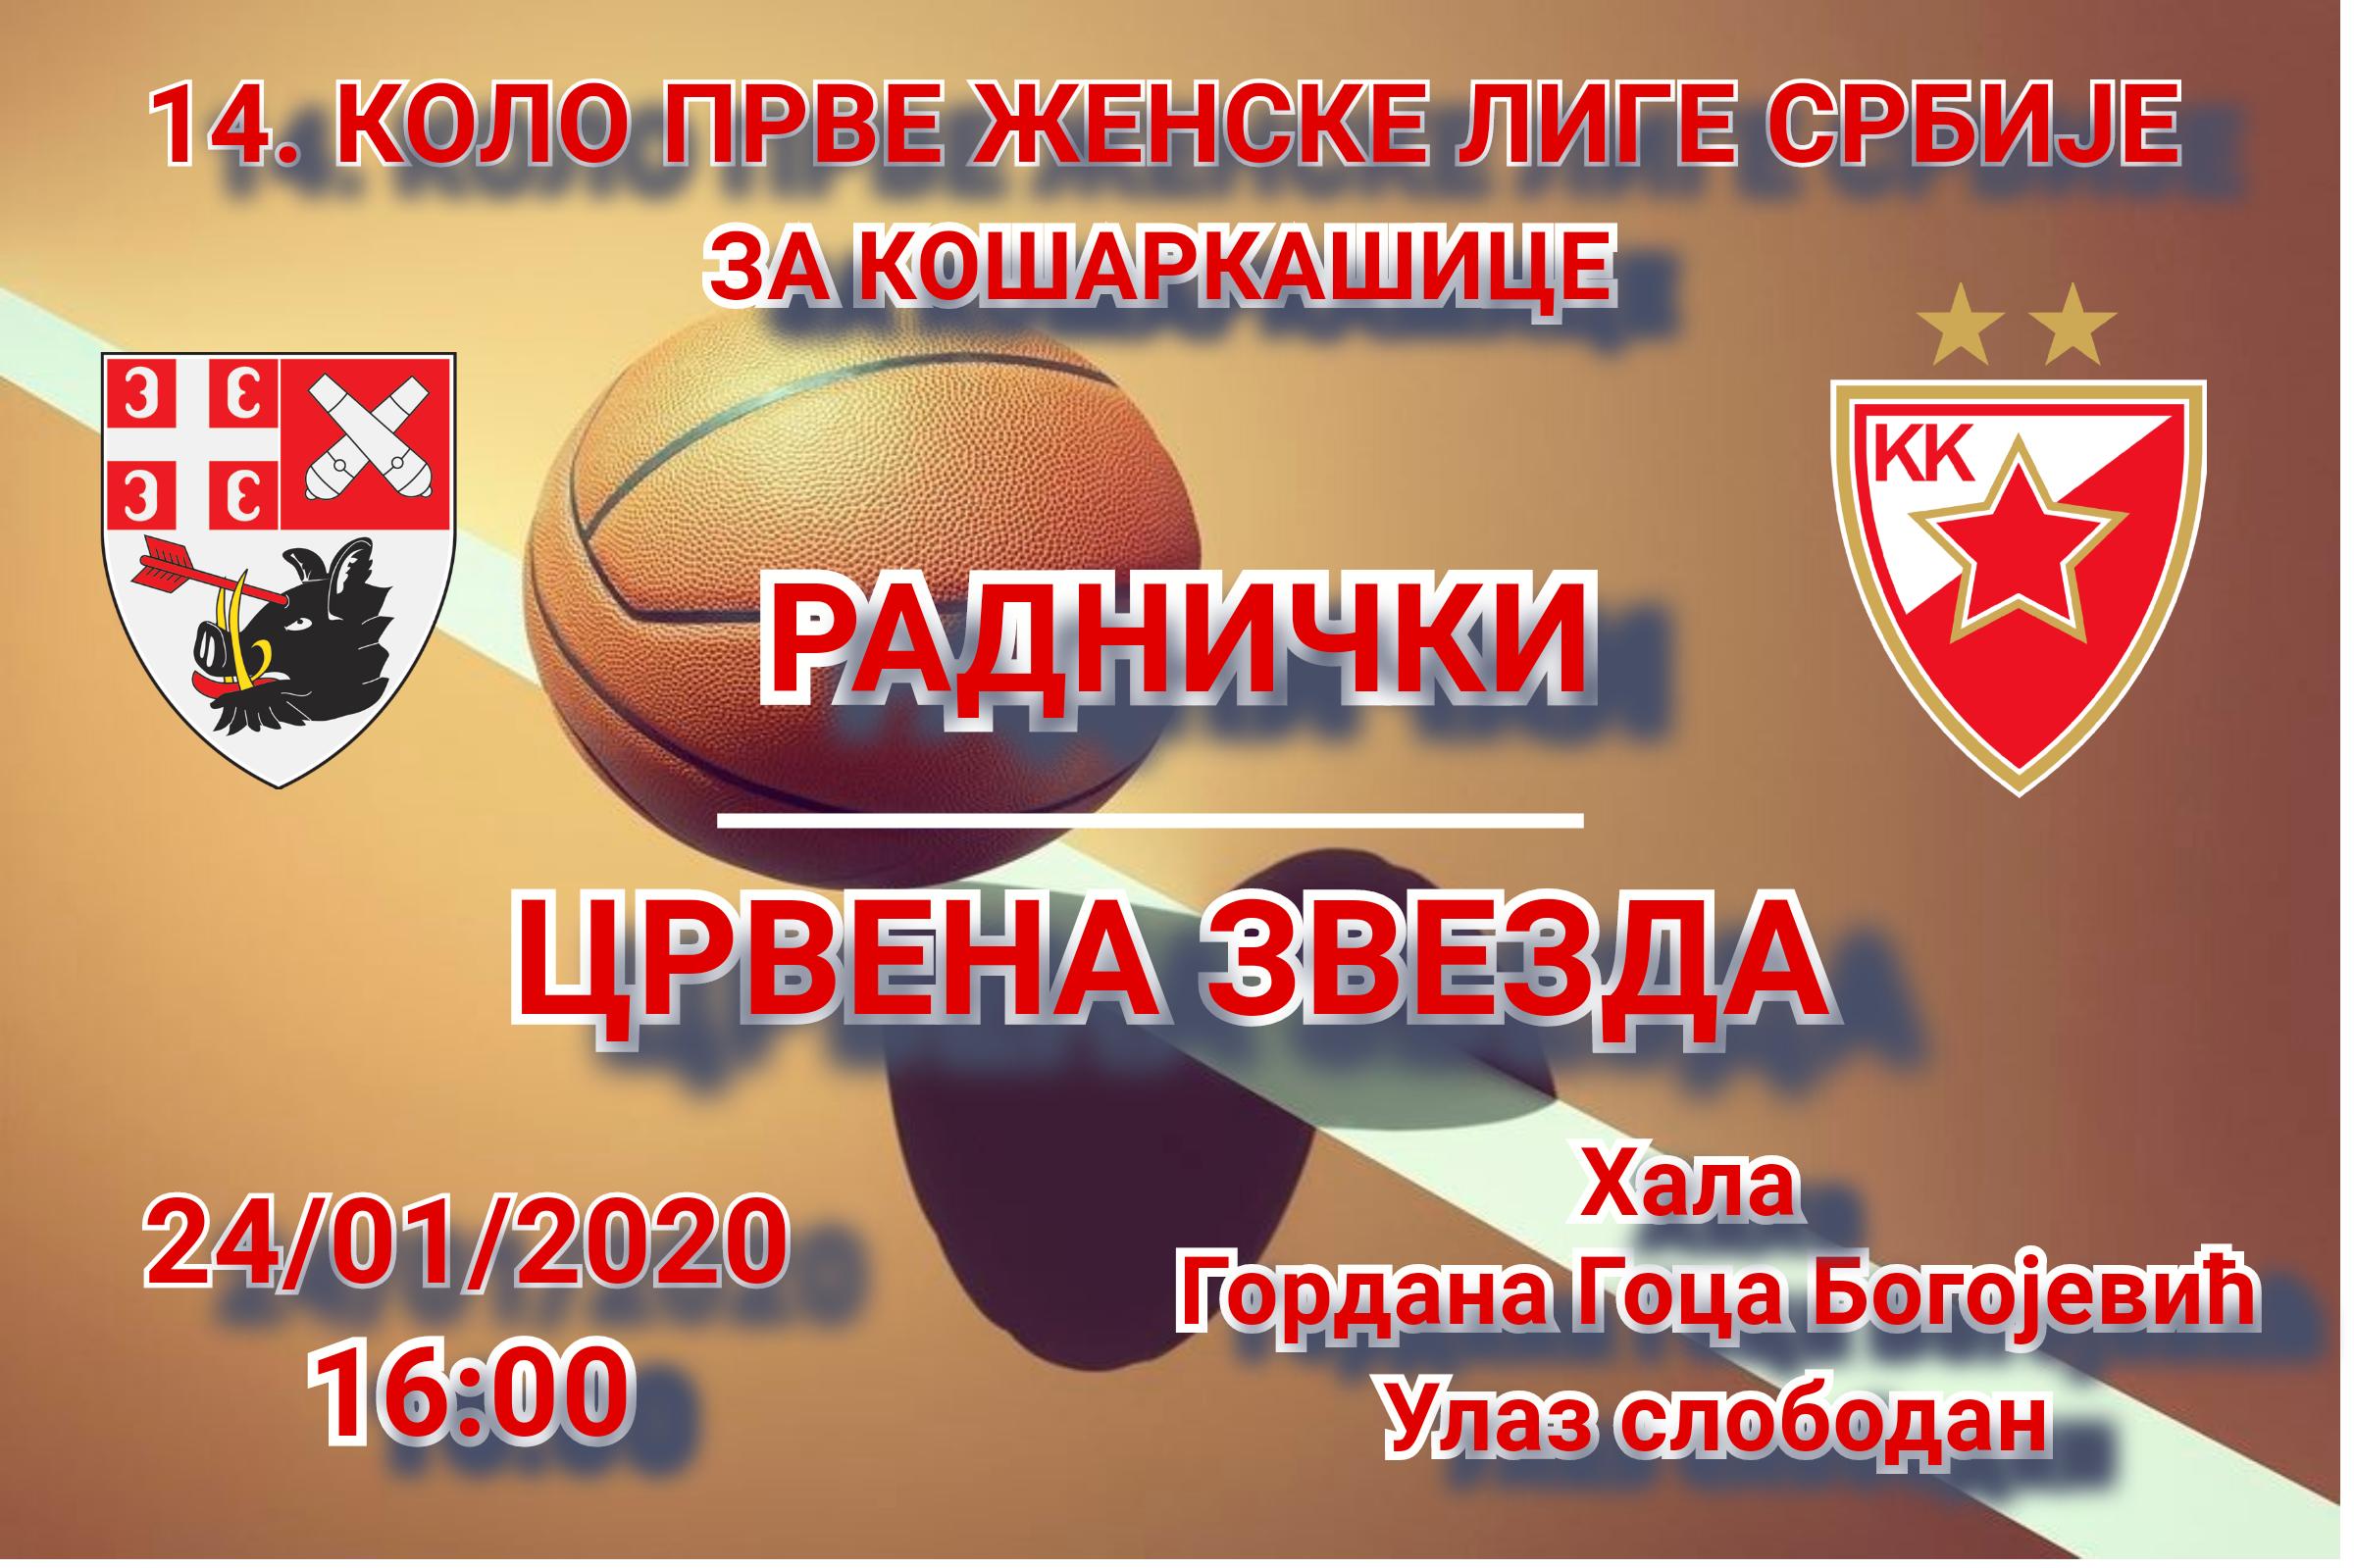 You are currently viewing Kragujevčanke odlučne u nameri da iznenade šampiona